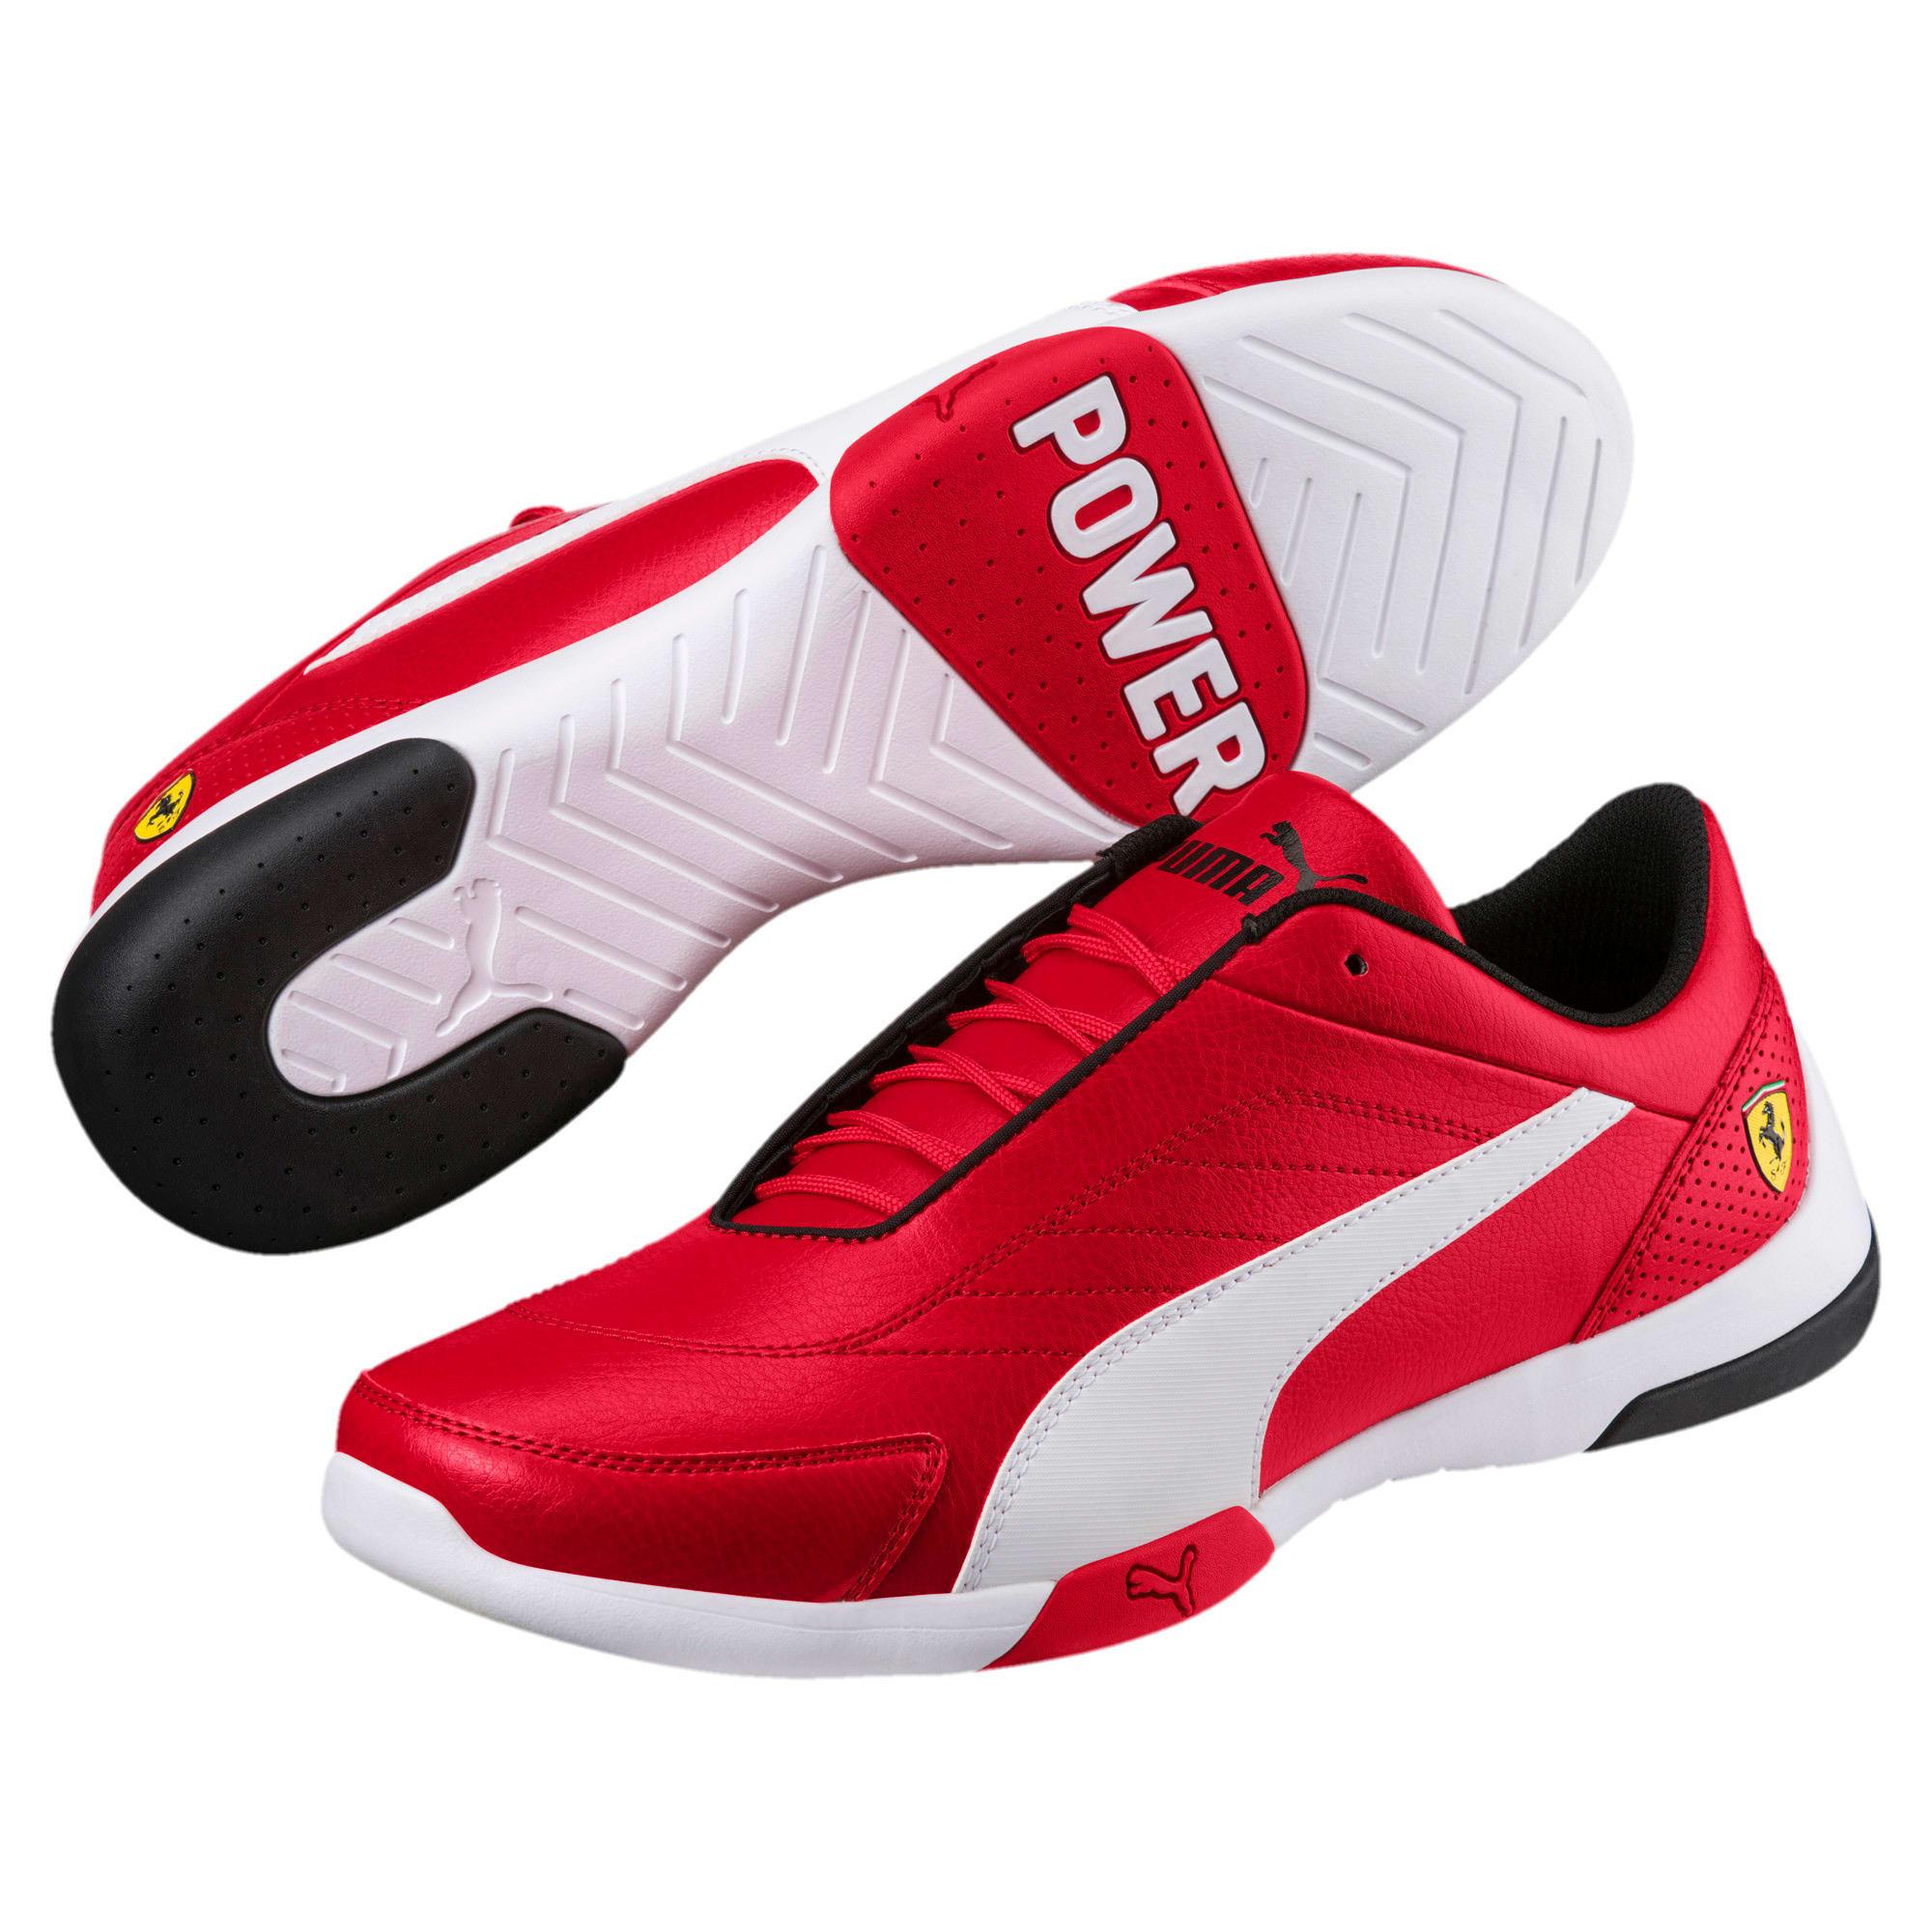 Thumbnail 2 of Scuderia Ferrari Kart Cat III Shoes, Rosso Corsa-Puma White, medium